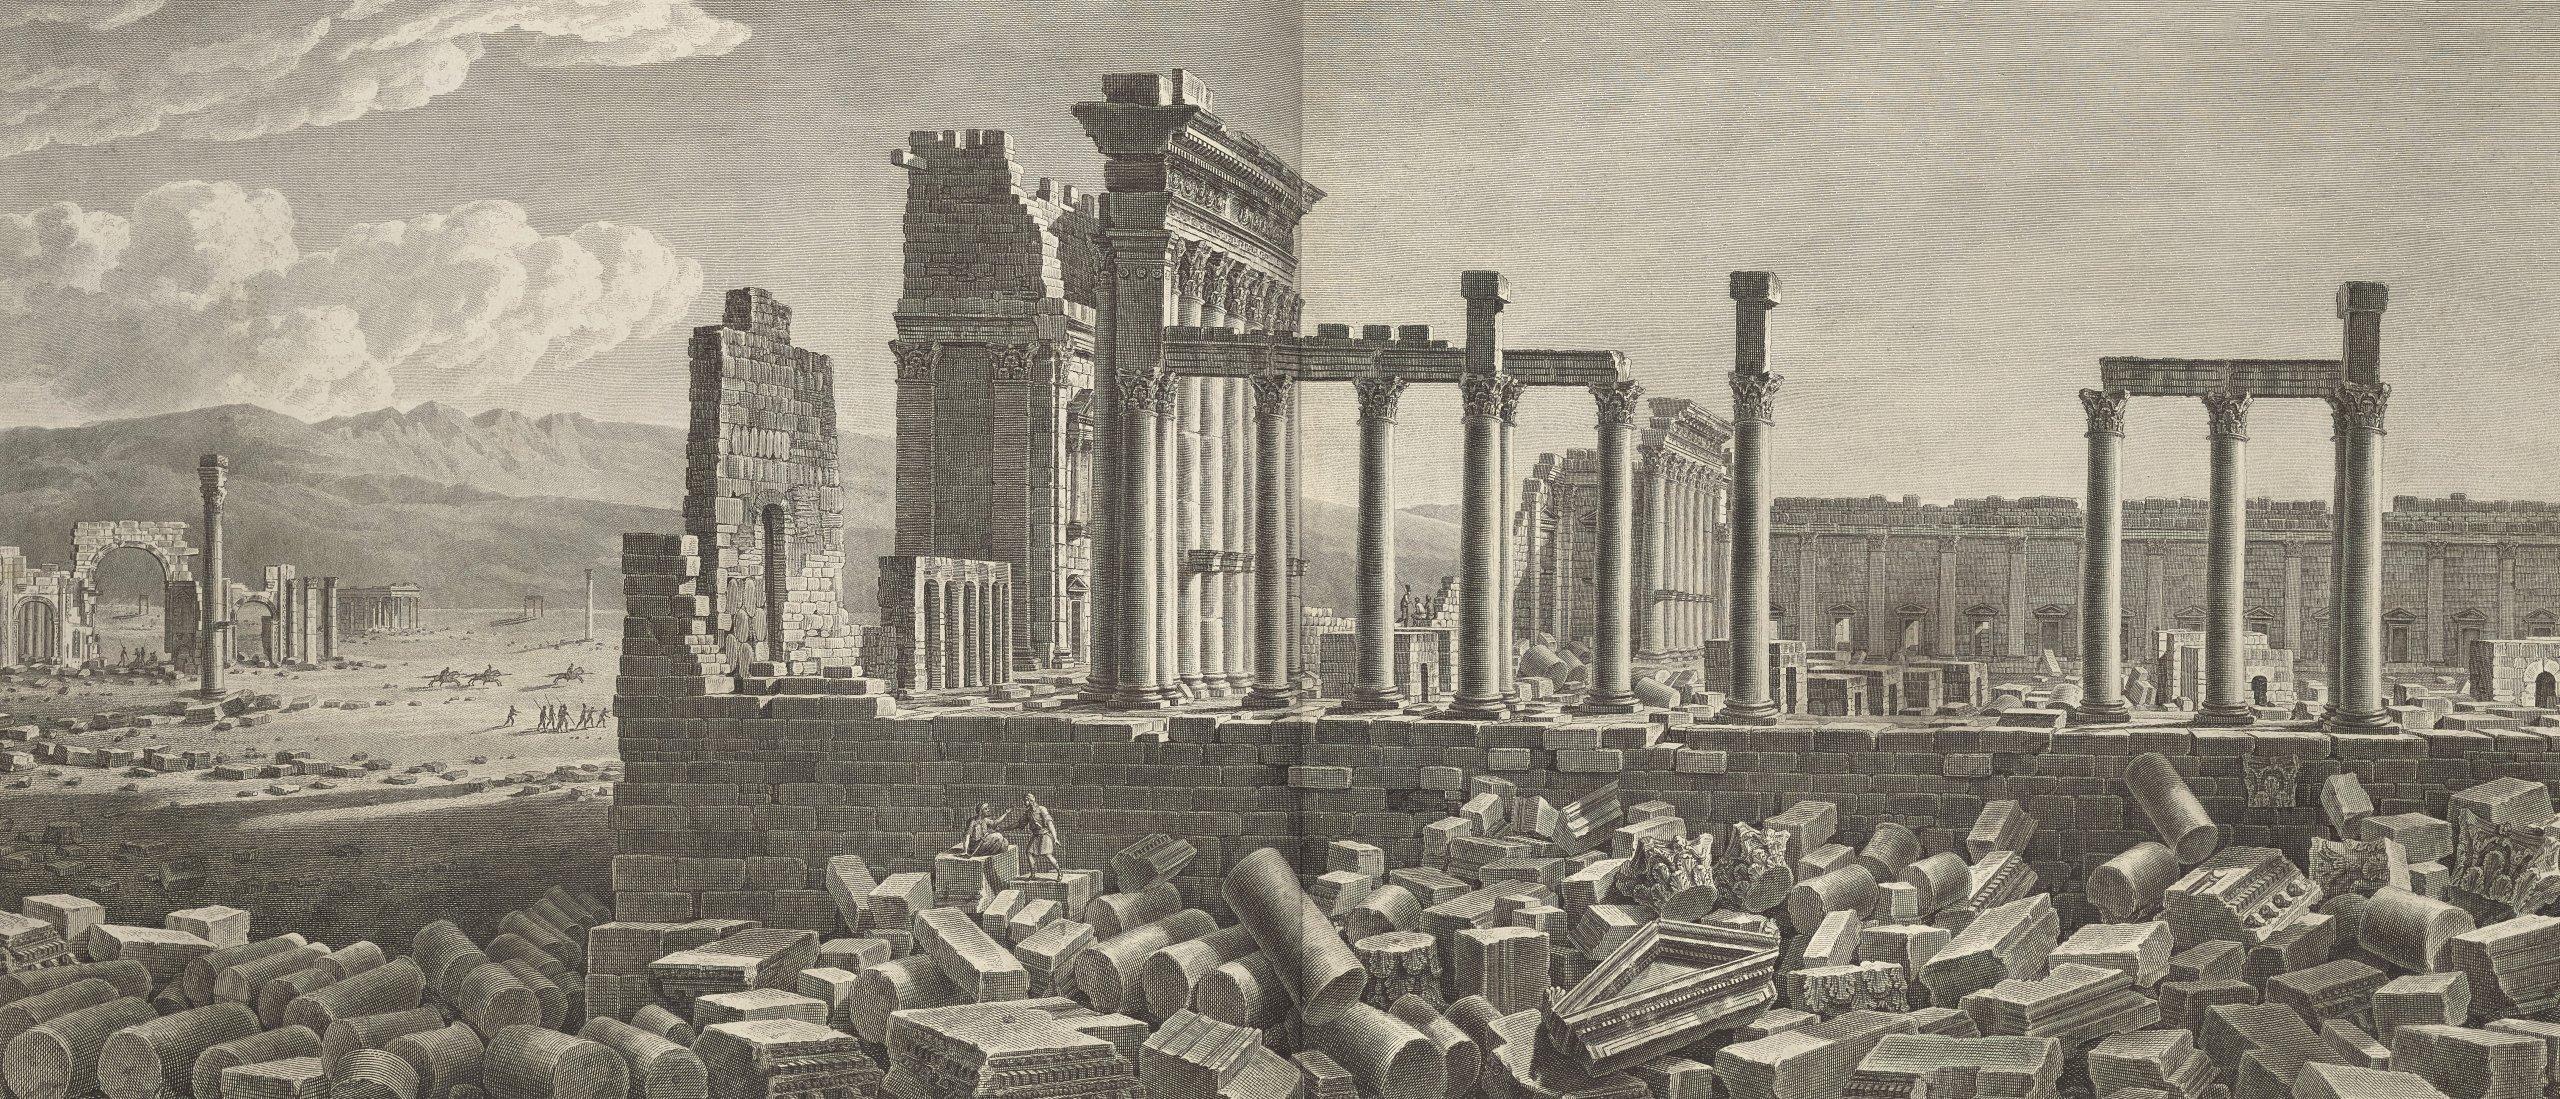 """Temple of Bel,"" Desmaisons and Jean-Baptiste Lienard after Louis-François Cassas, etching, 45.5 by 92.5 centimeters. (Courtesy of Getty)"